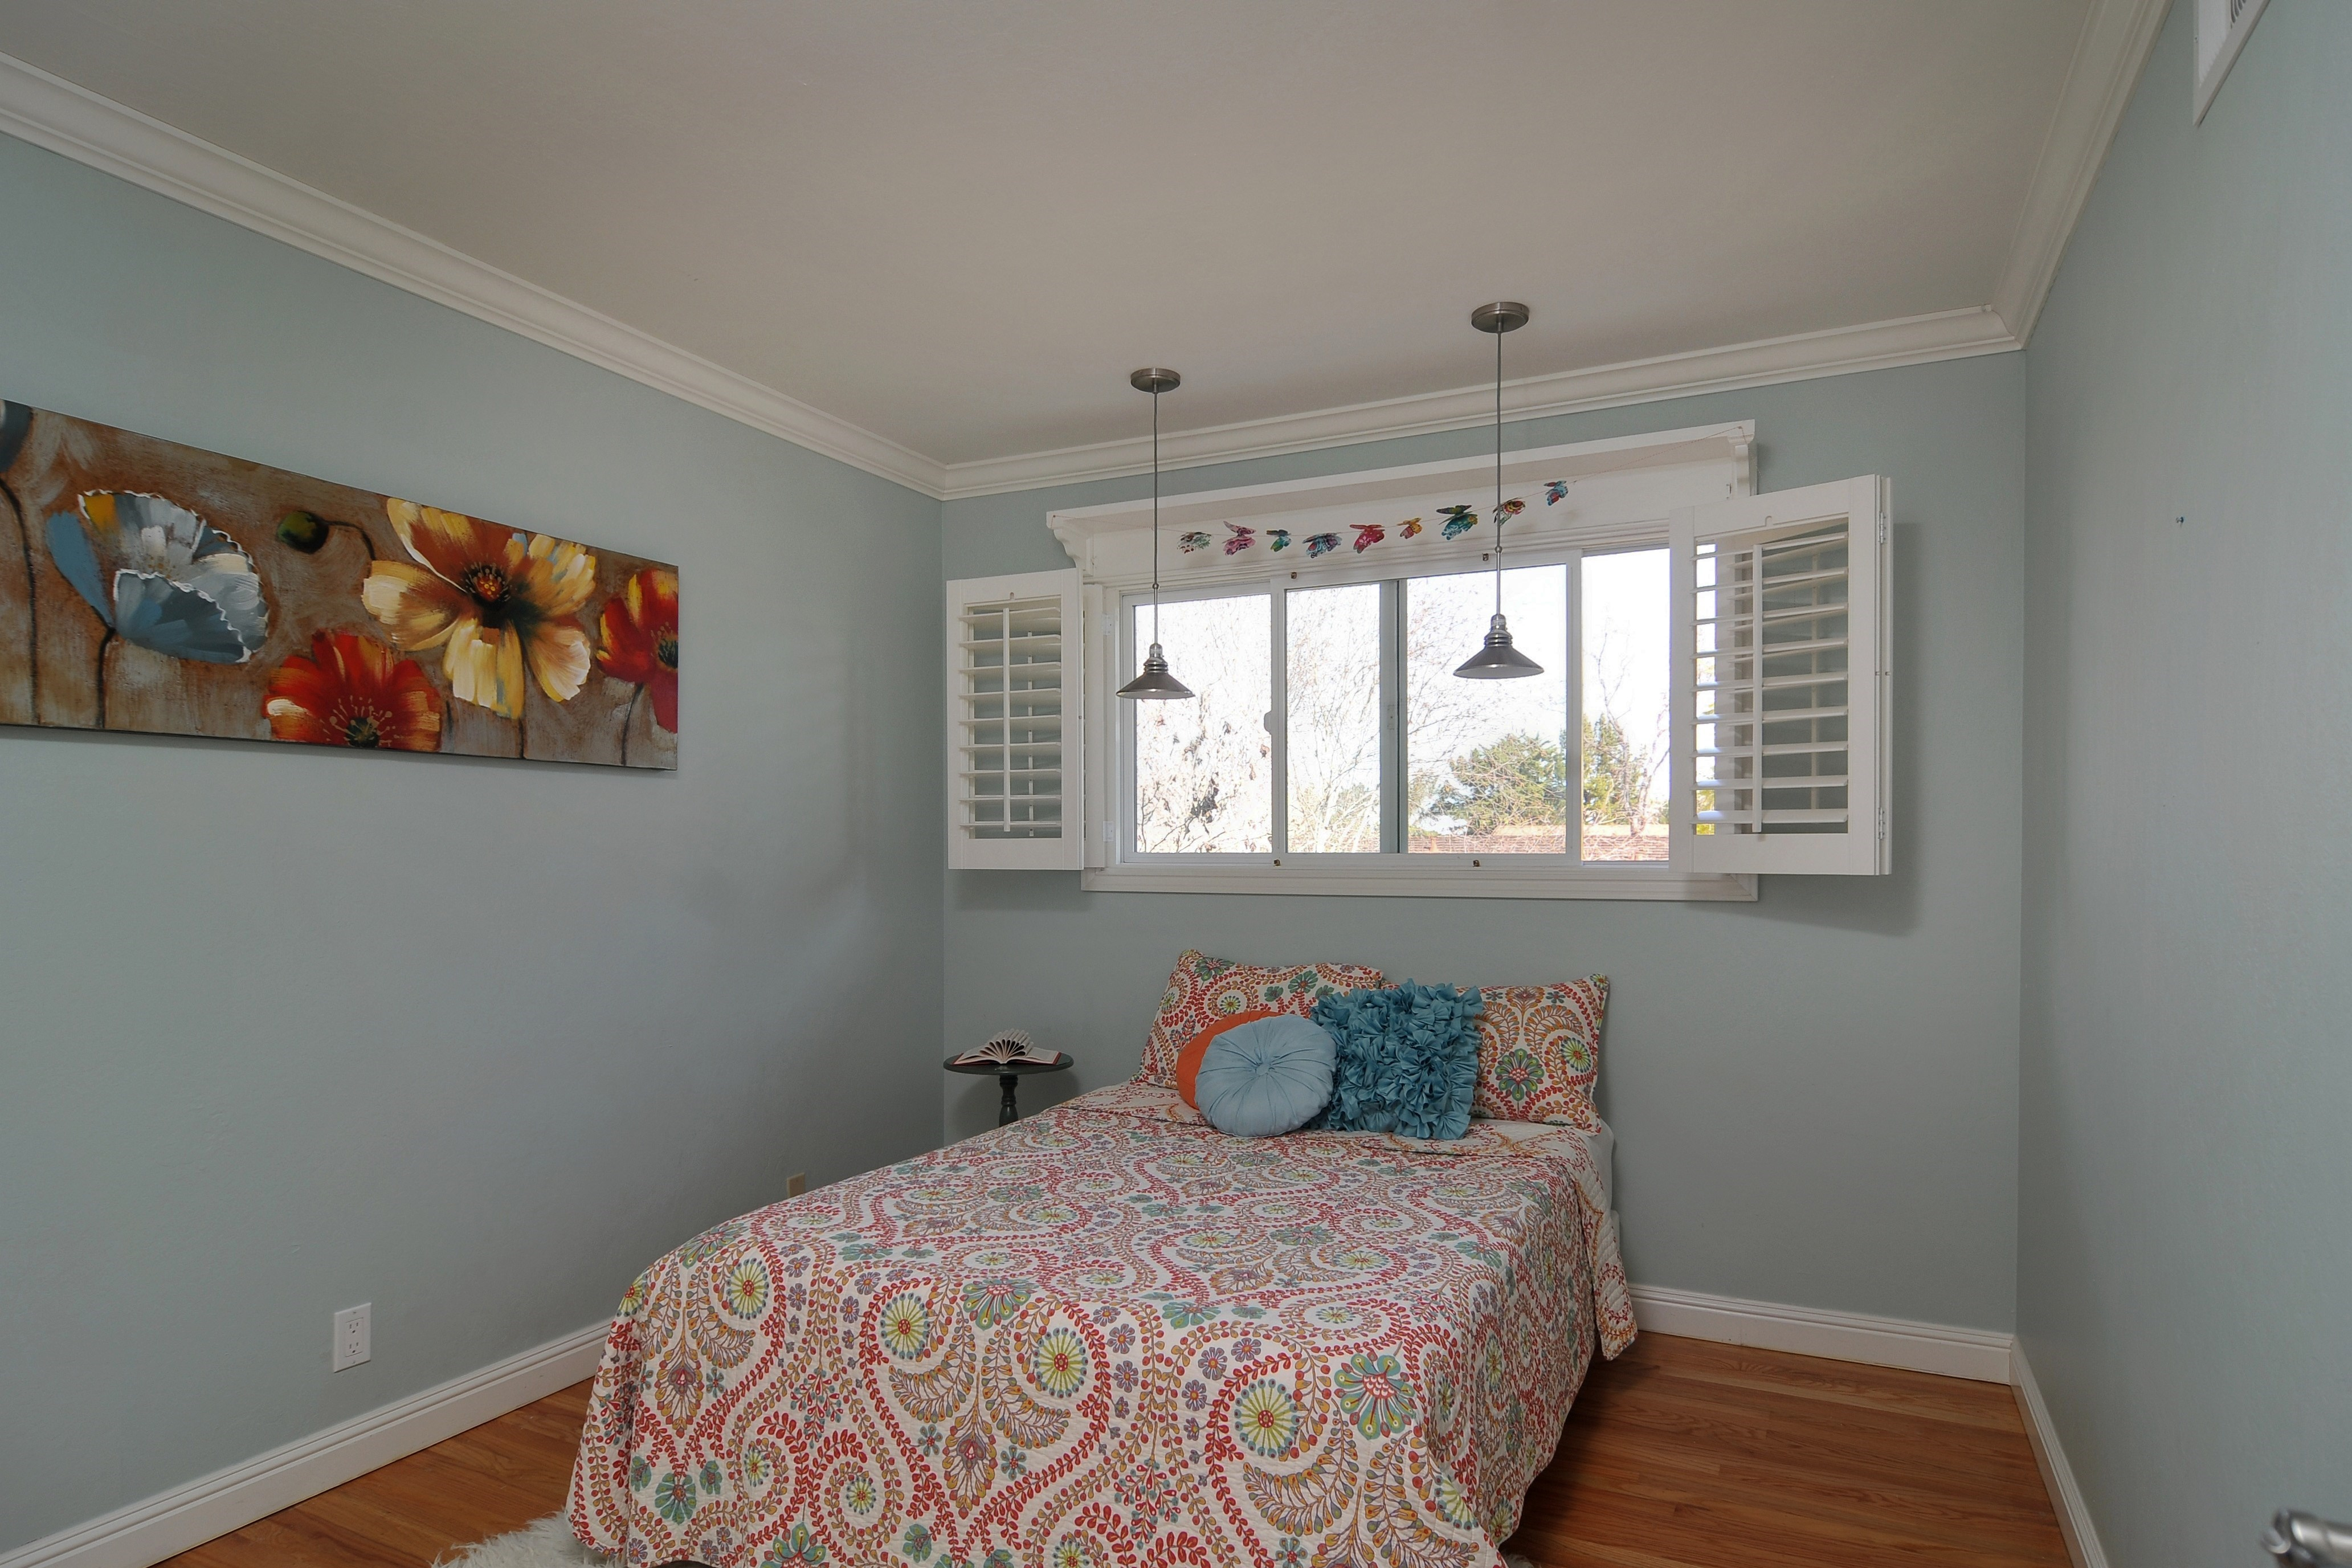 021 Bedroom 4 - Exquisite, expansive, remodeled Belwood home - 127 Belhaven Drive, Los Gatos